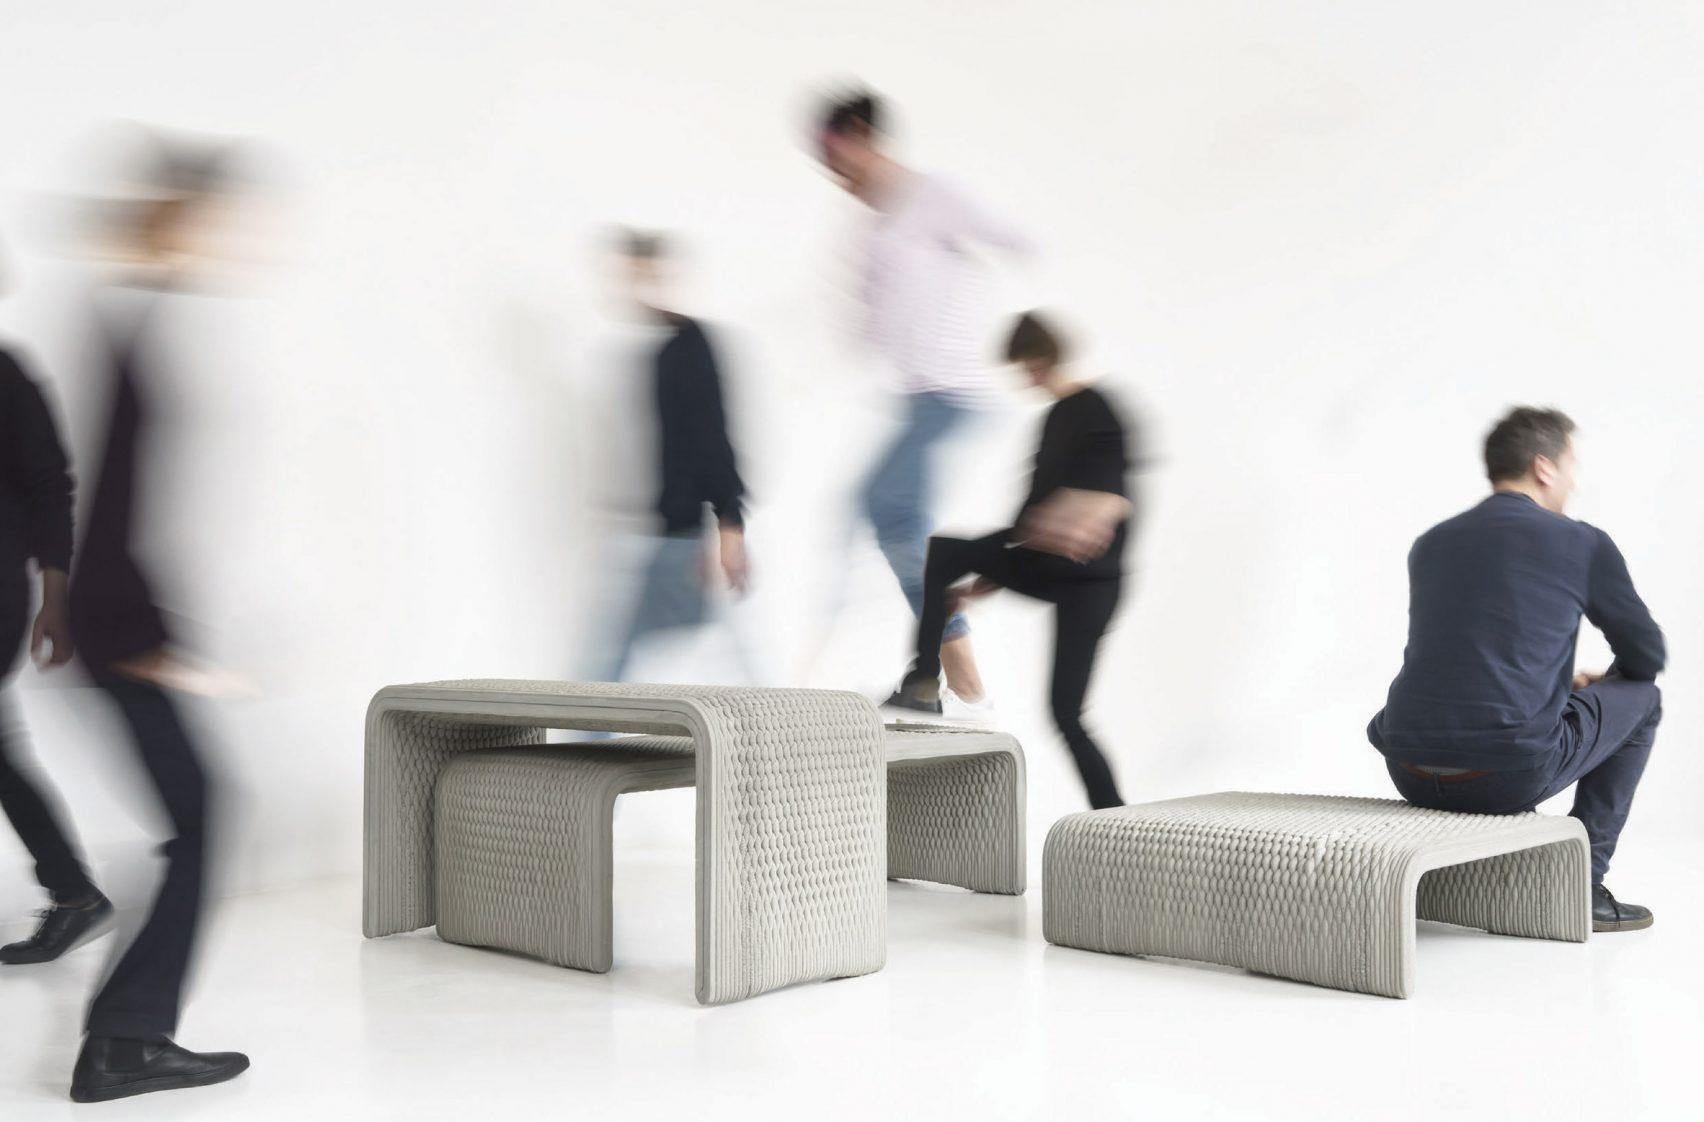 3D printed concrete benches resemble woven textiles